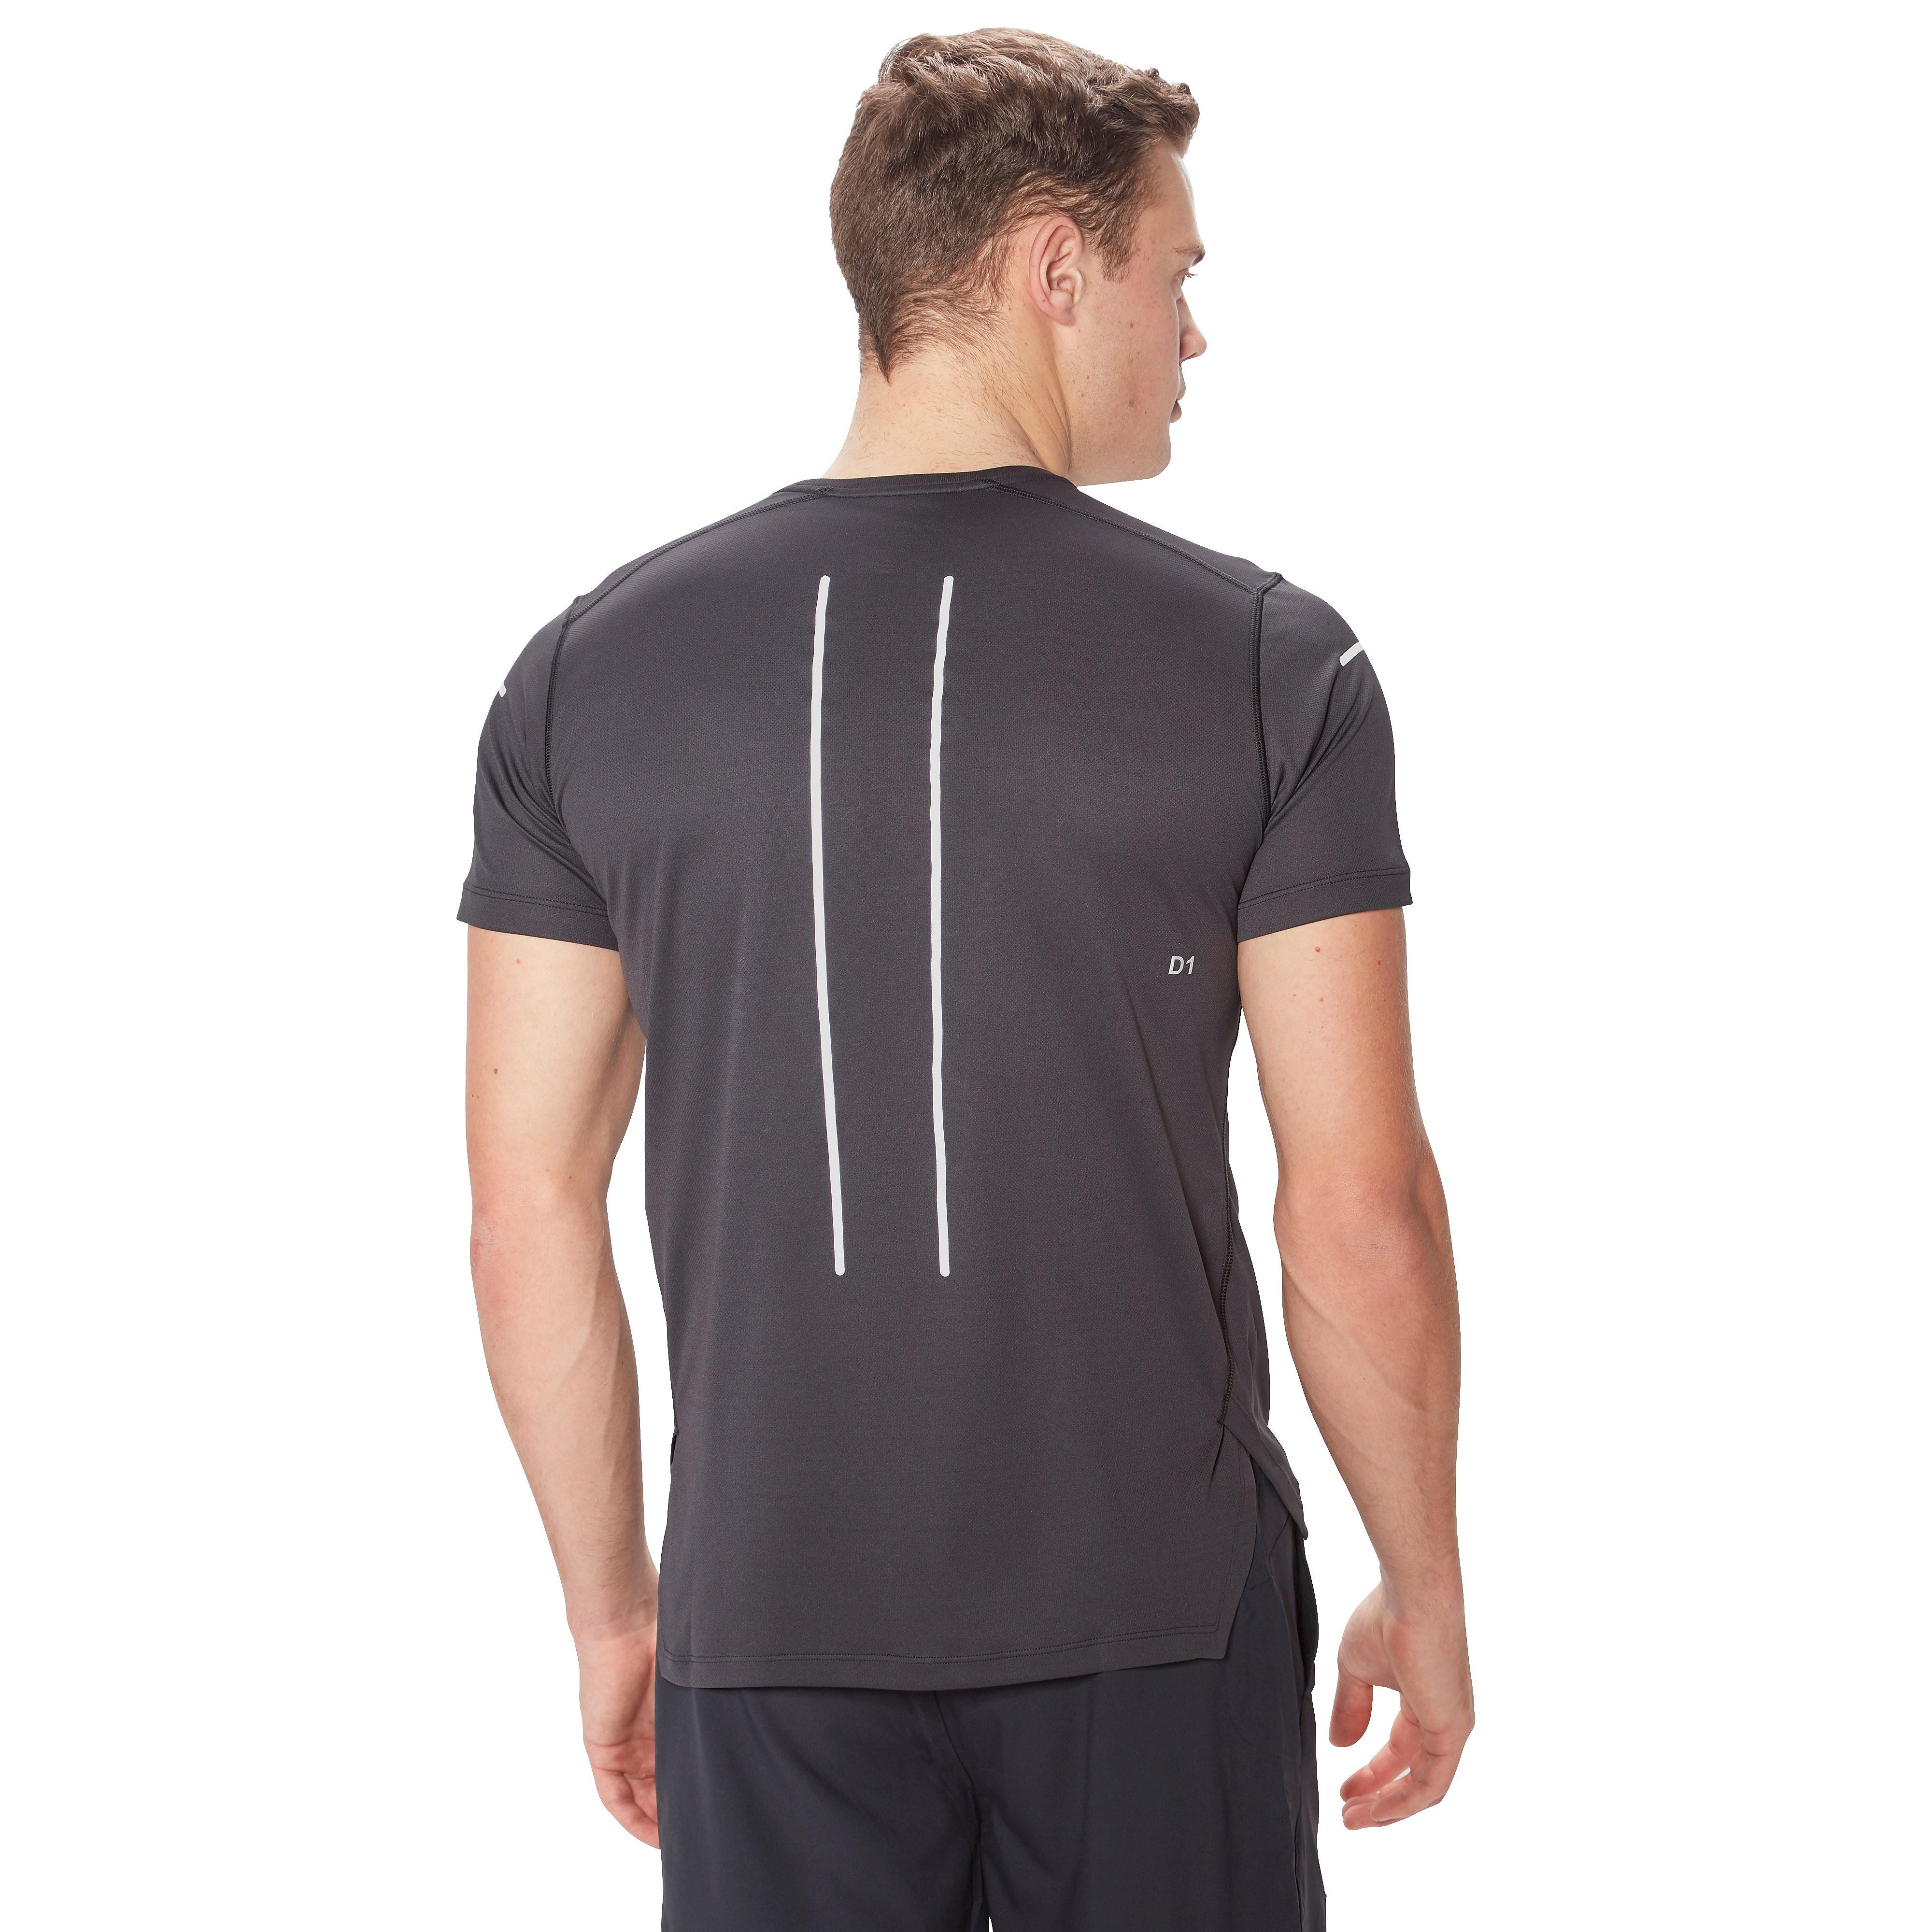 ASICS Lite-Show Short Sleeve Men's Running Top